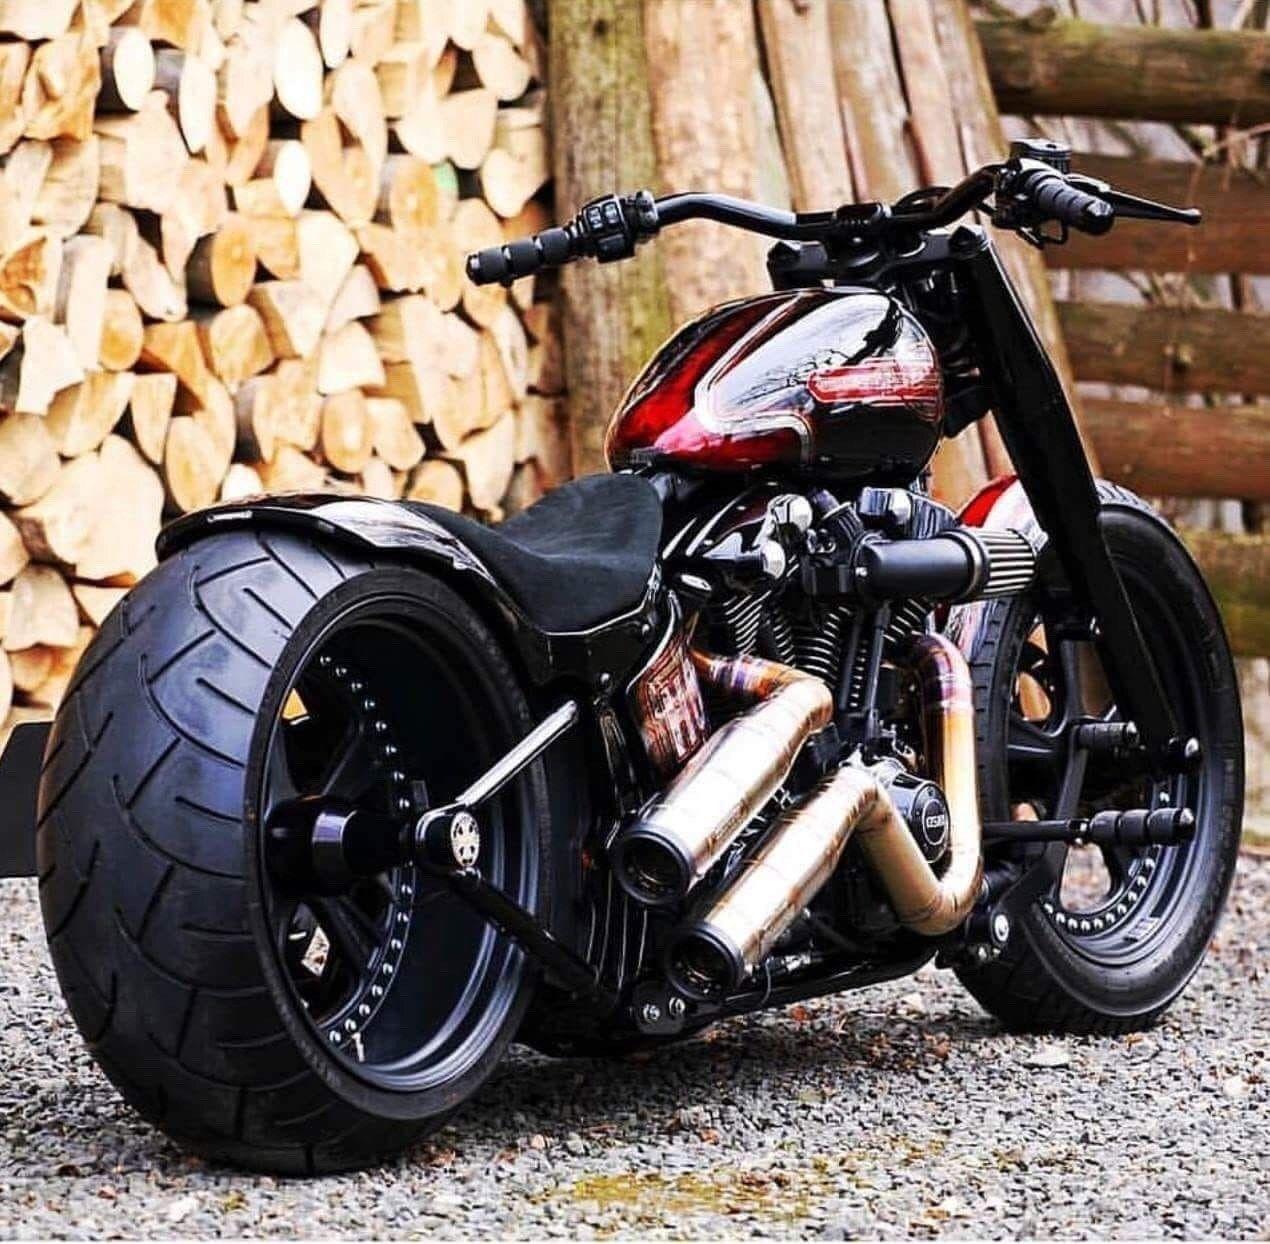 Motorcycle Harley Custom Custombike Ride Bikerstyle Bikerfashion Customize Chopper Bobber Caferace Motorcycle Harley Bobber Motorcycle Custom Bobber